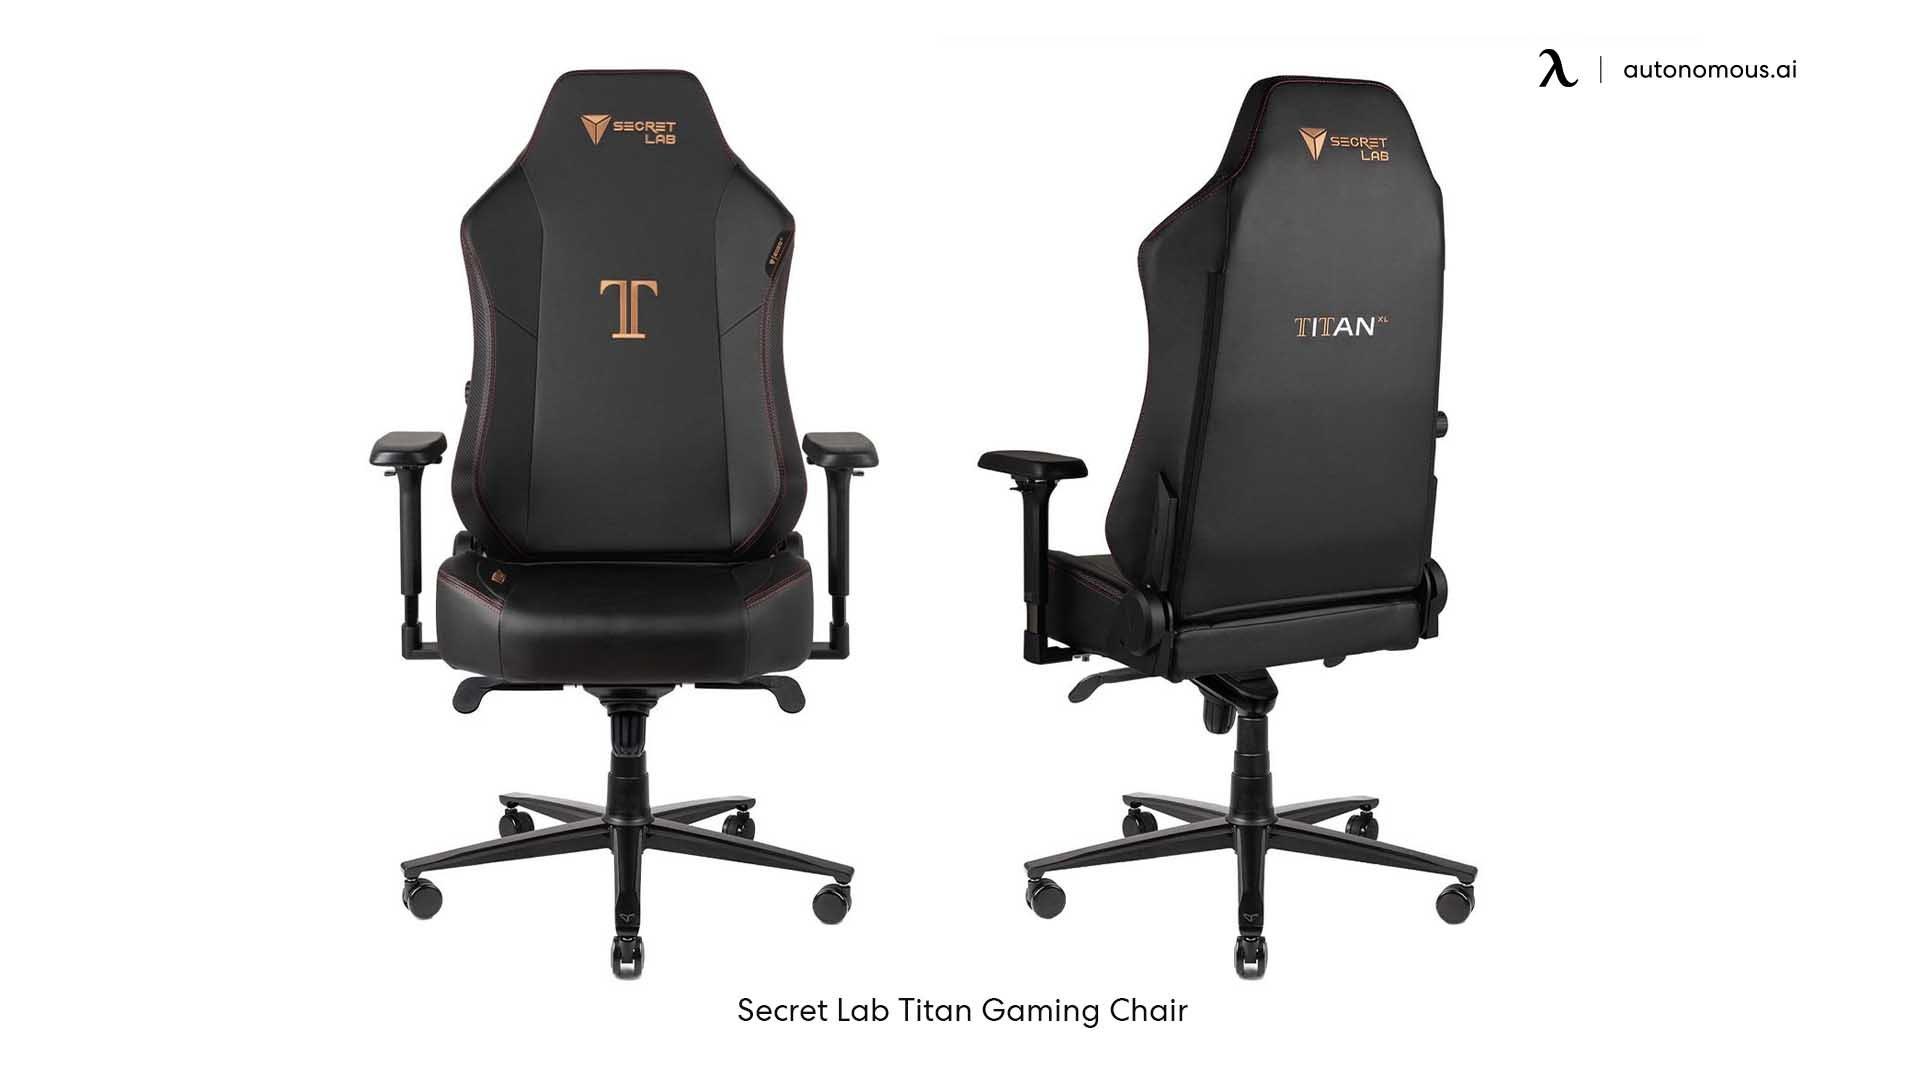 Secret Lab Titan Gaming modern desk chair